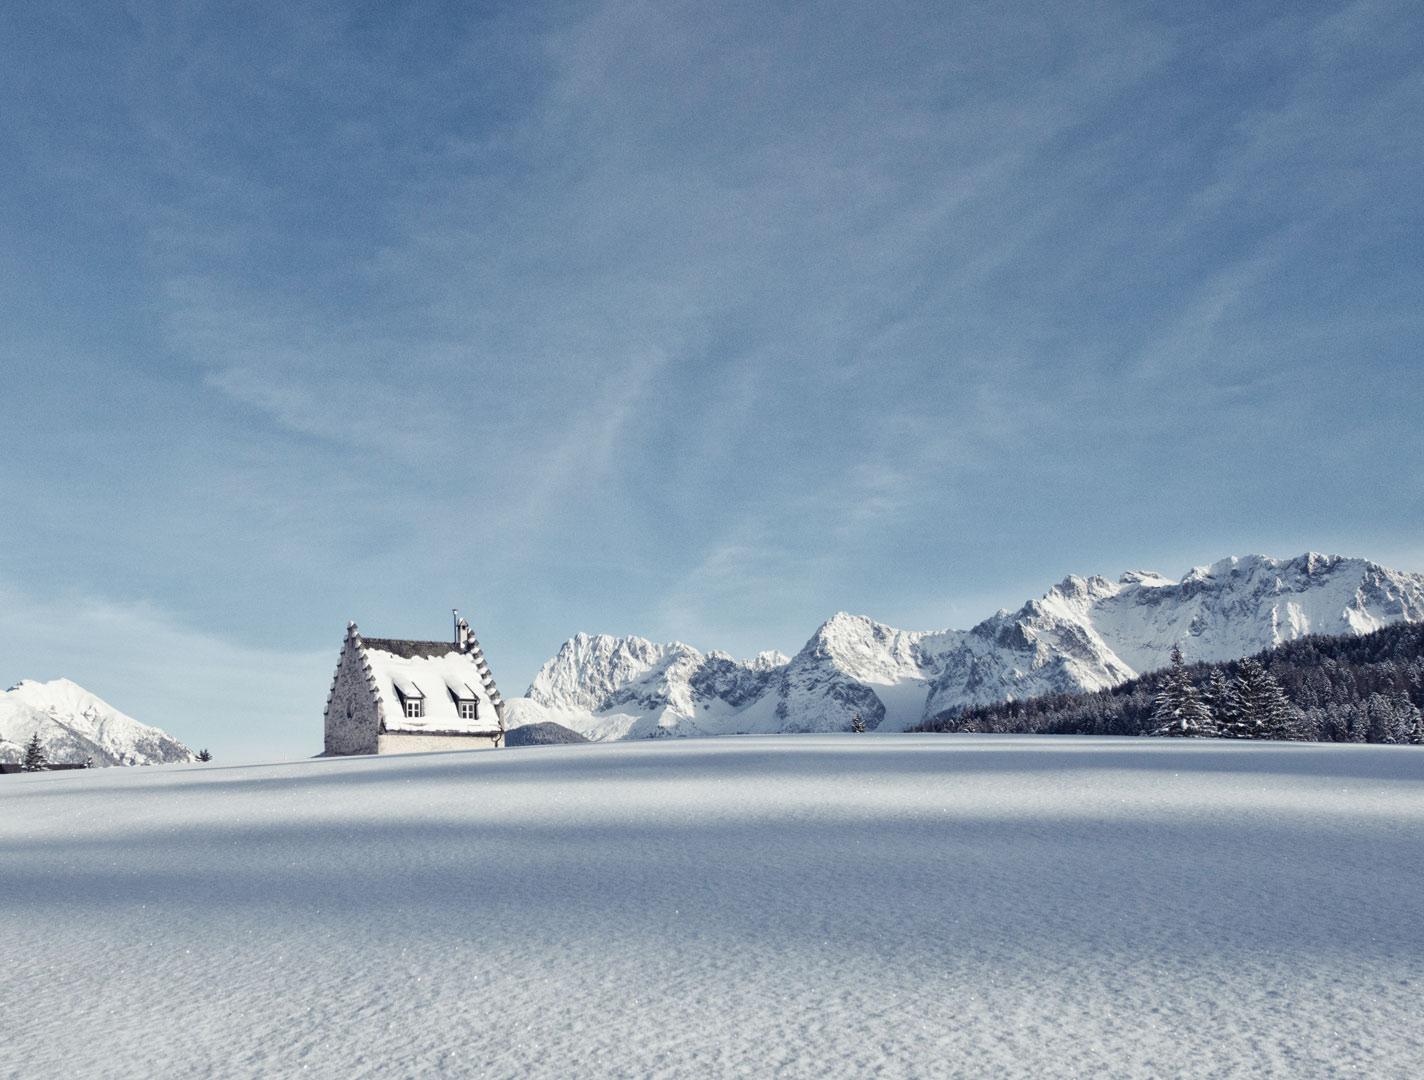 kranzbach-winter-hideaways@2